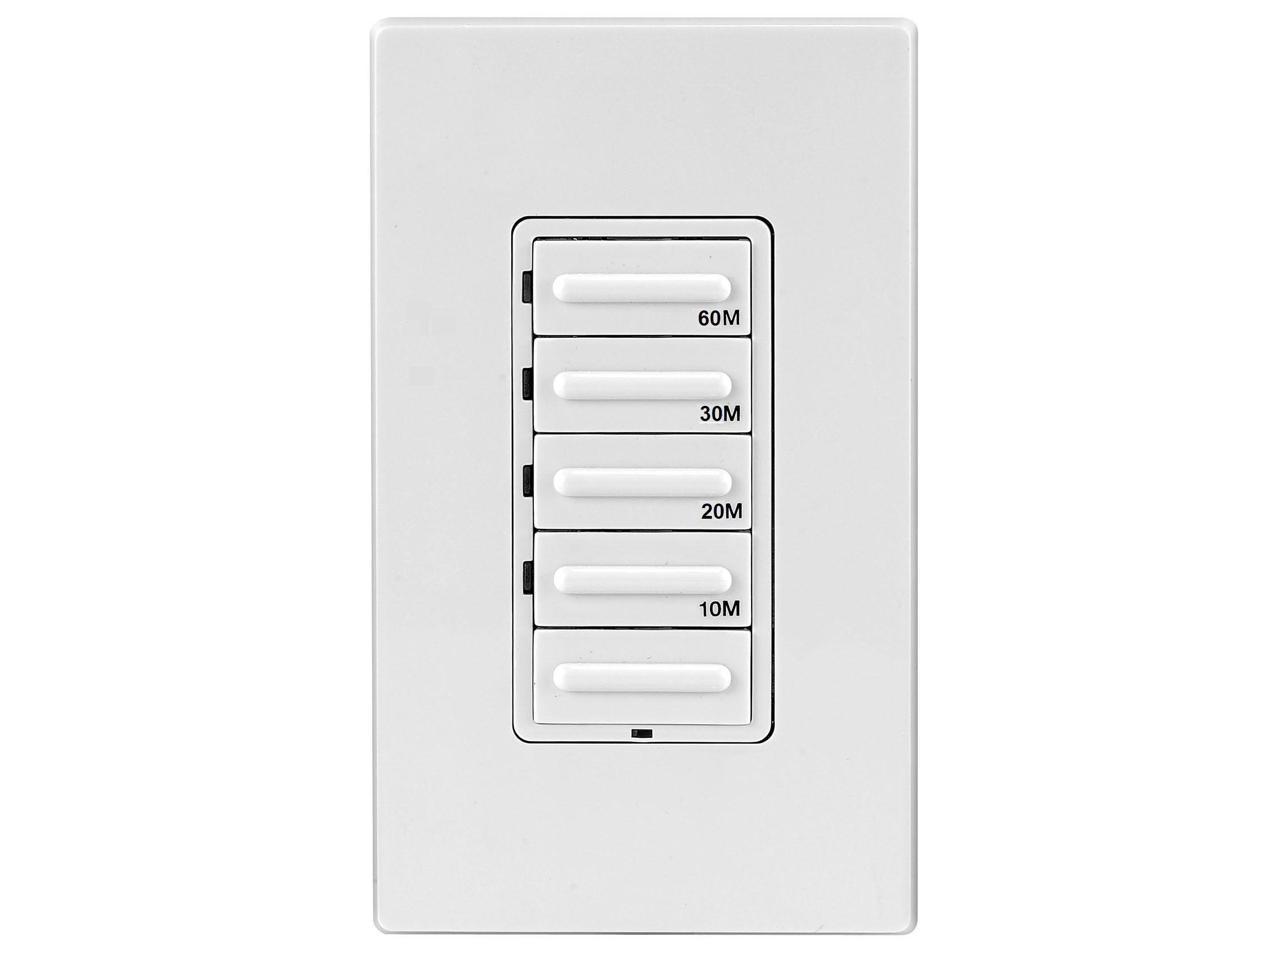 Leviton Decora Preset Countdown Timer Wall Switch, 155 Min LTB155 15LZ